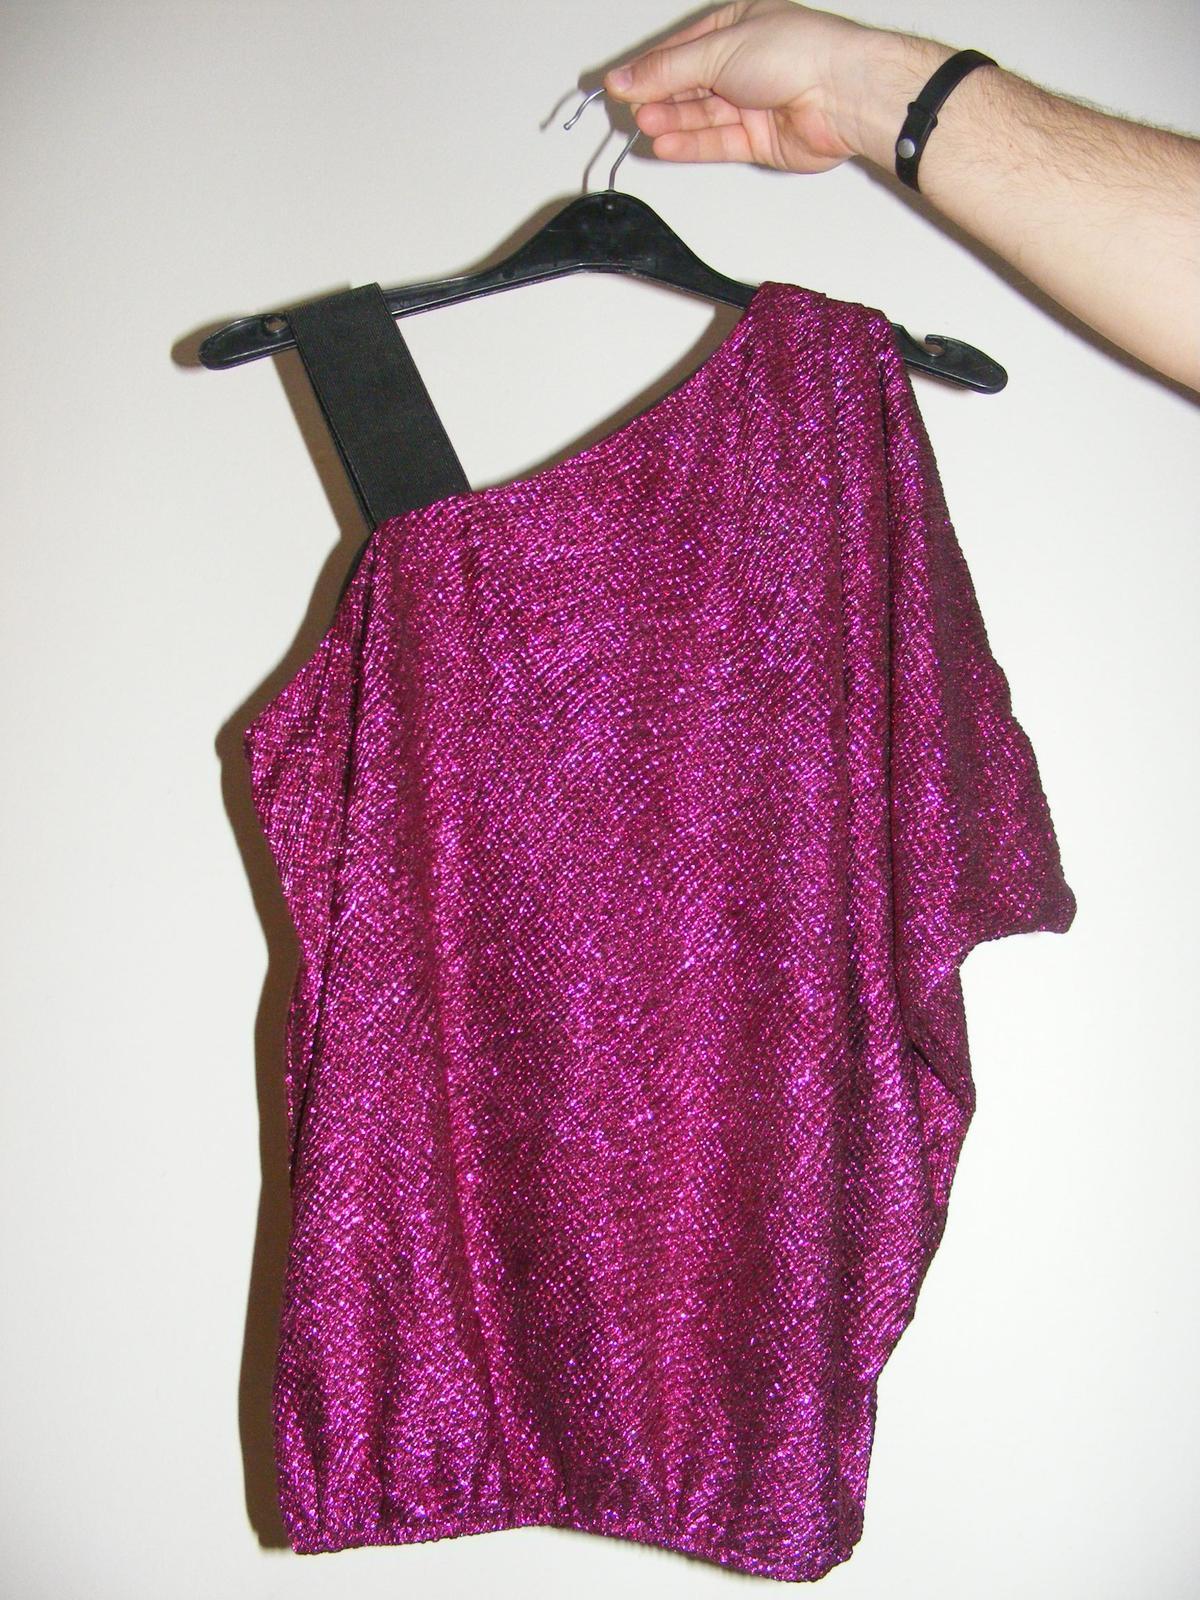 Lesklé elegantné tričko - Obrázok č. 1